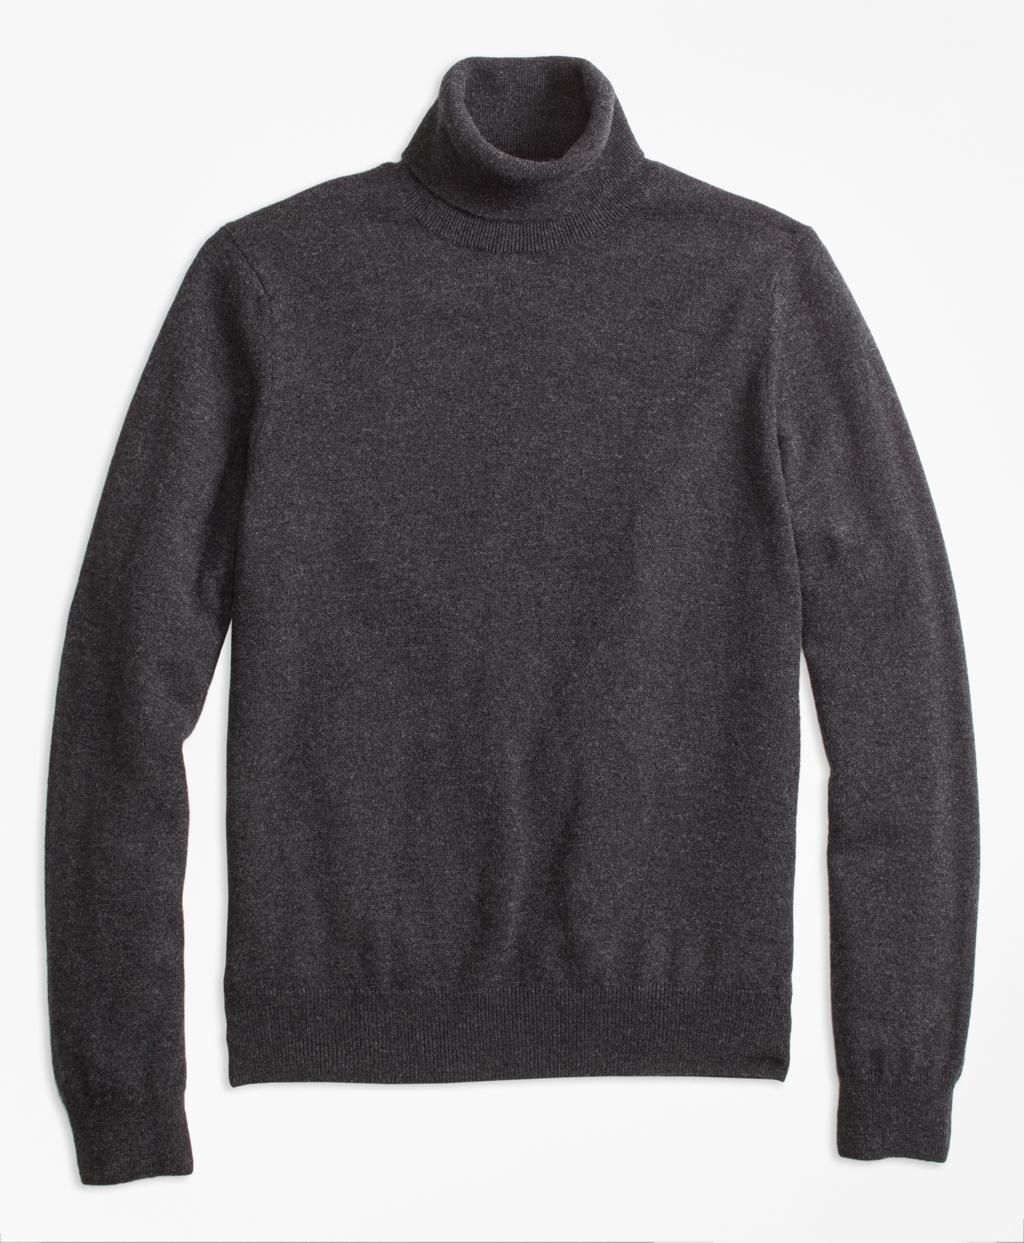 Edwardian Men's Shirts & Sweaters Brooks Brothers Mens Turtleneck Cashmere Sweater $328.00 AT vintagedancer.com